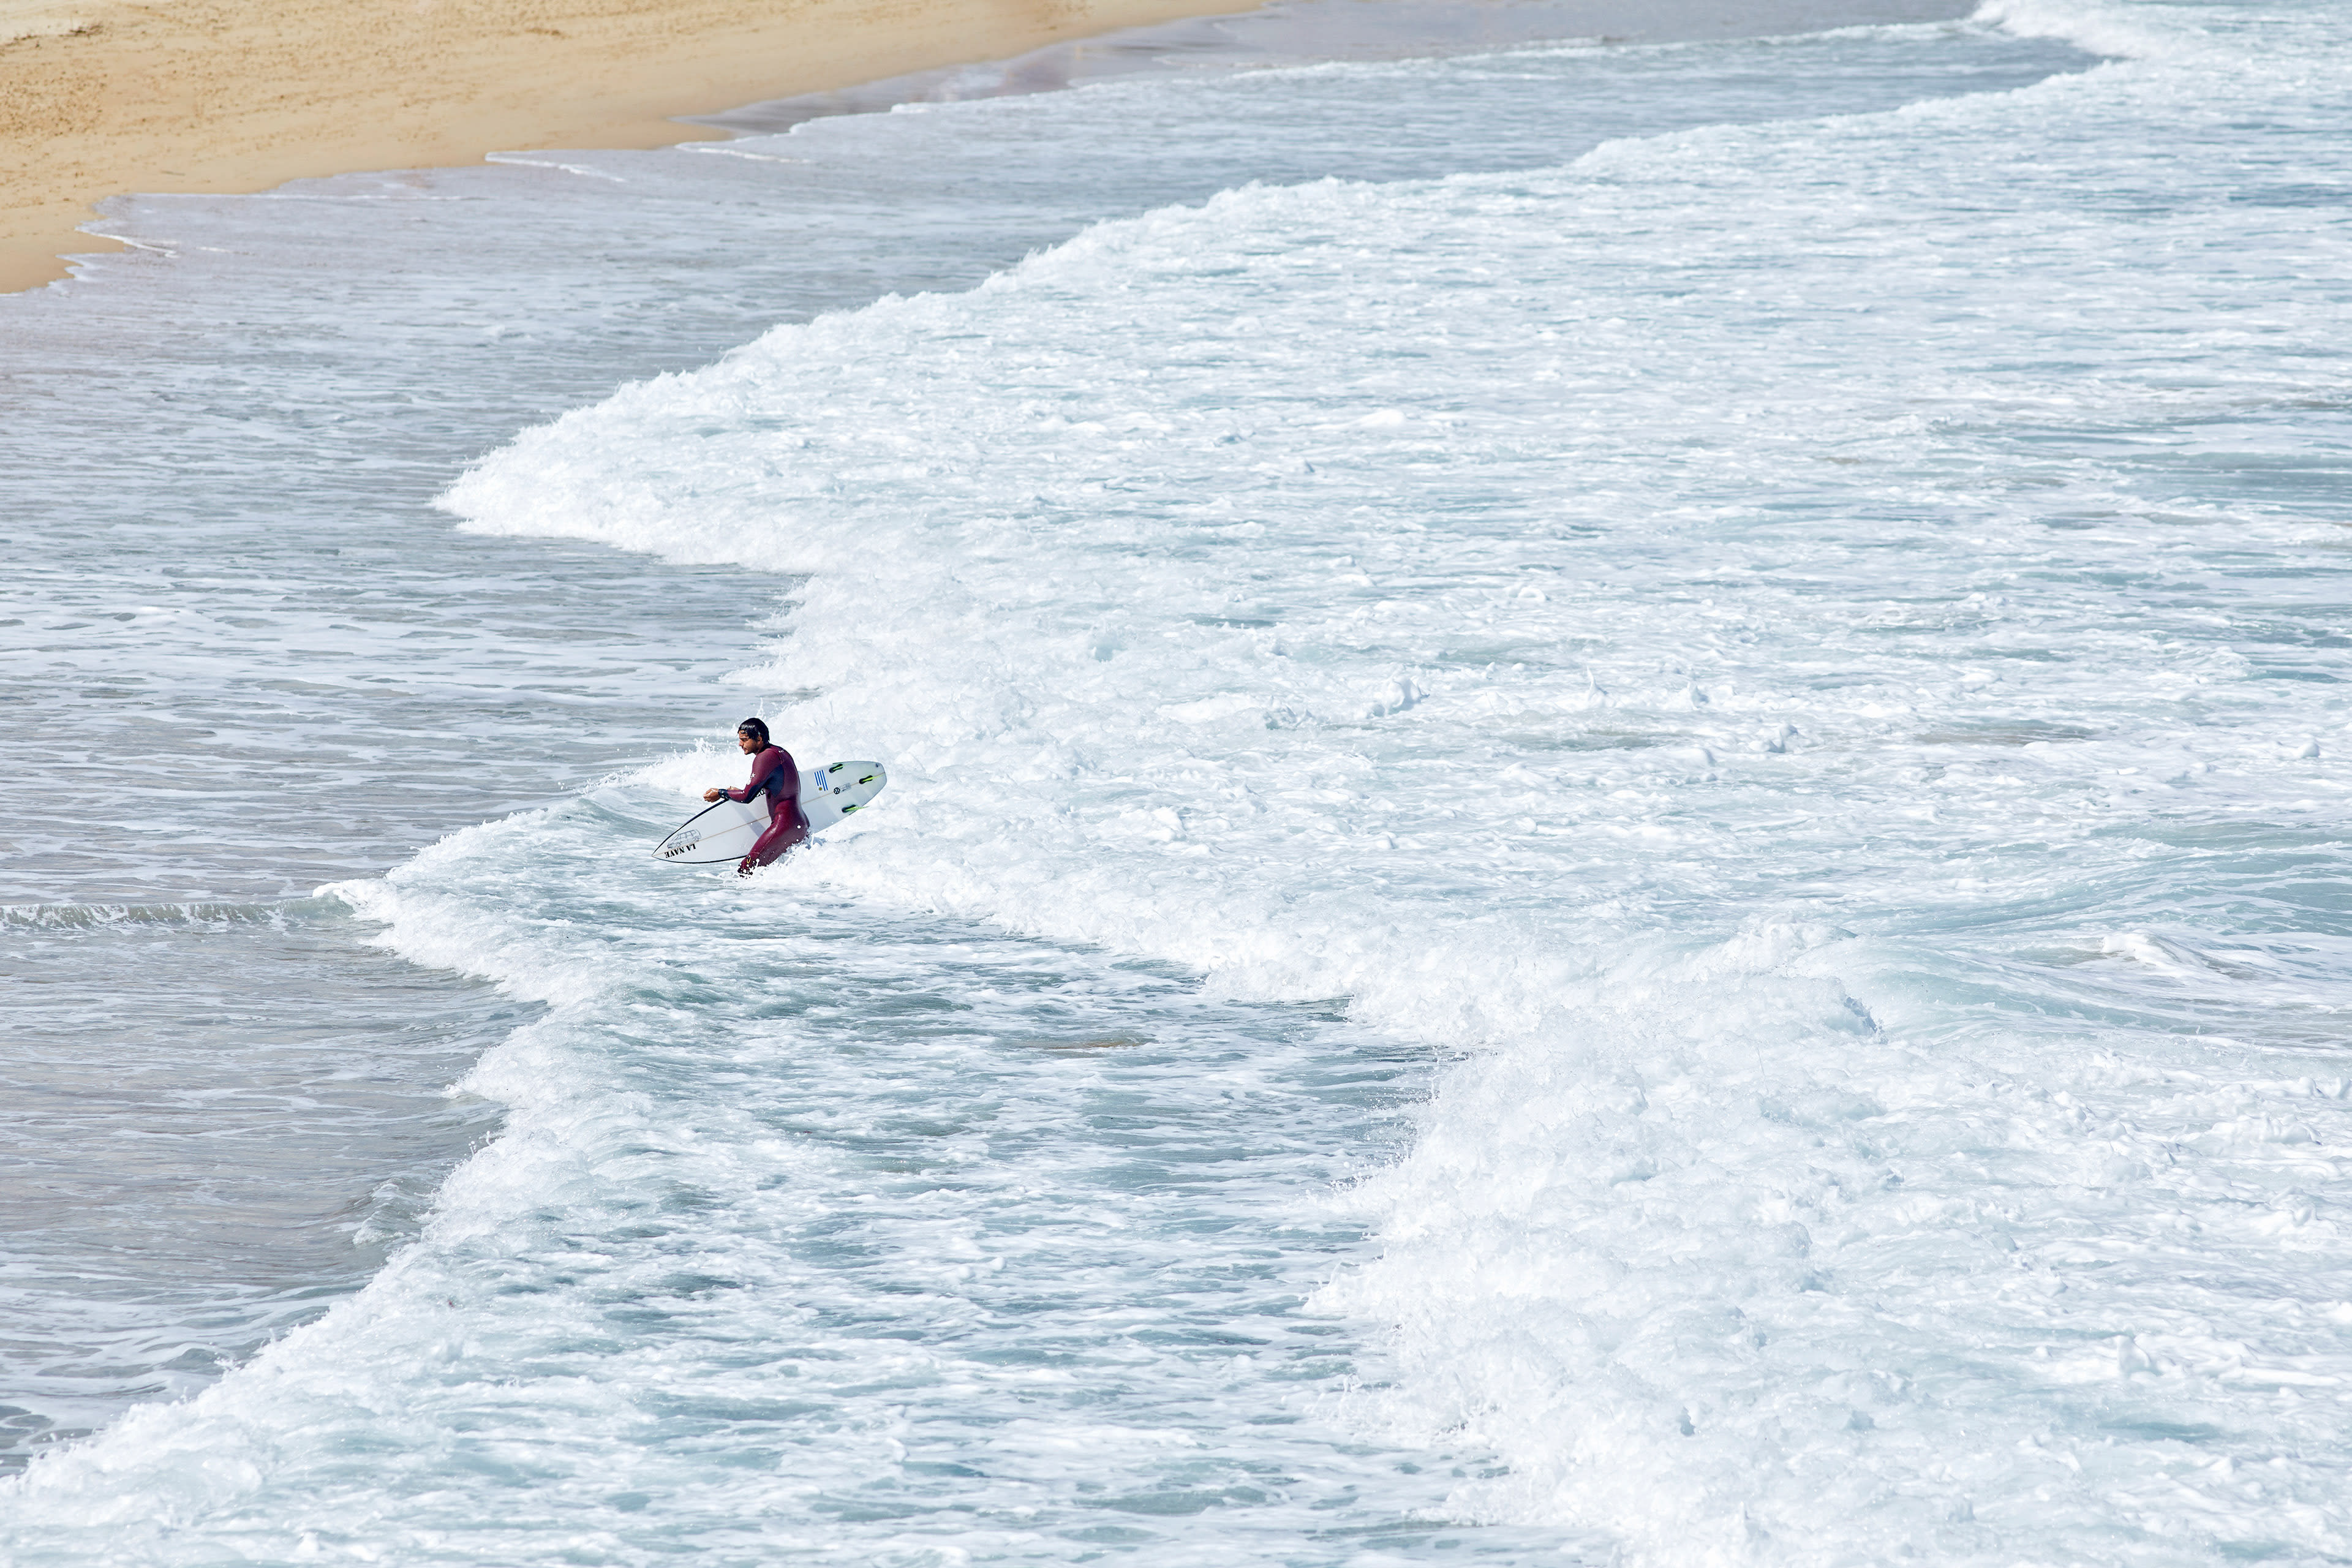 Richard Moran Beech Surf Skate Personal 014